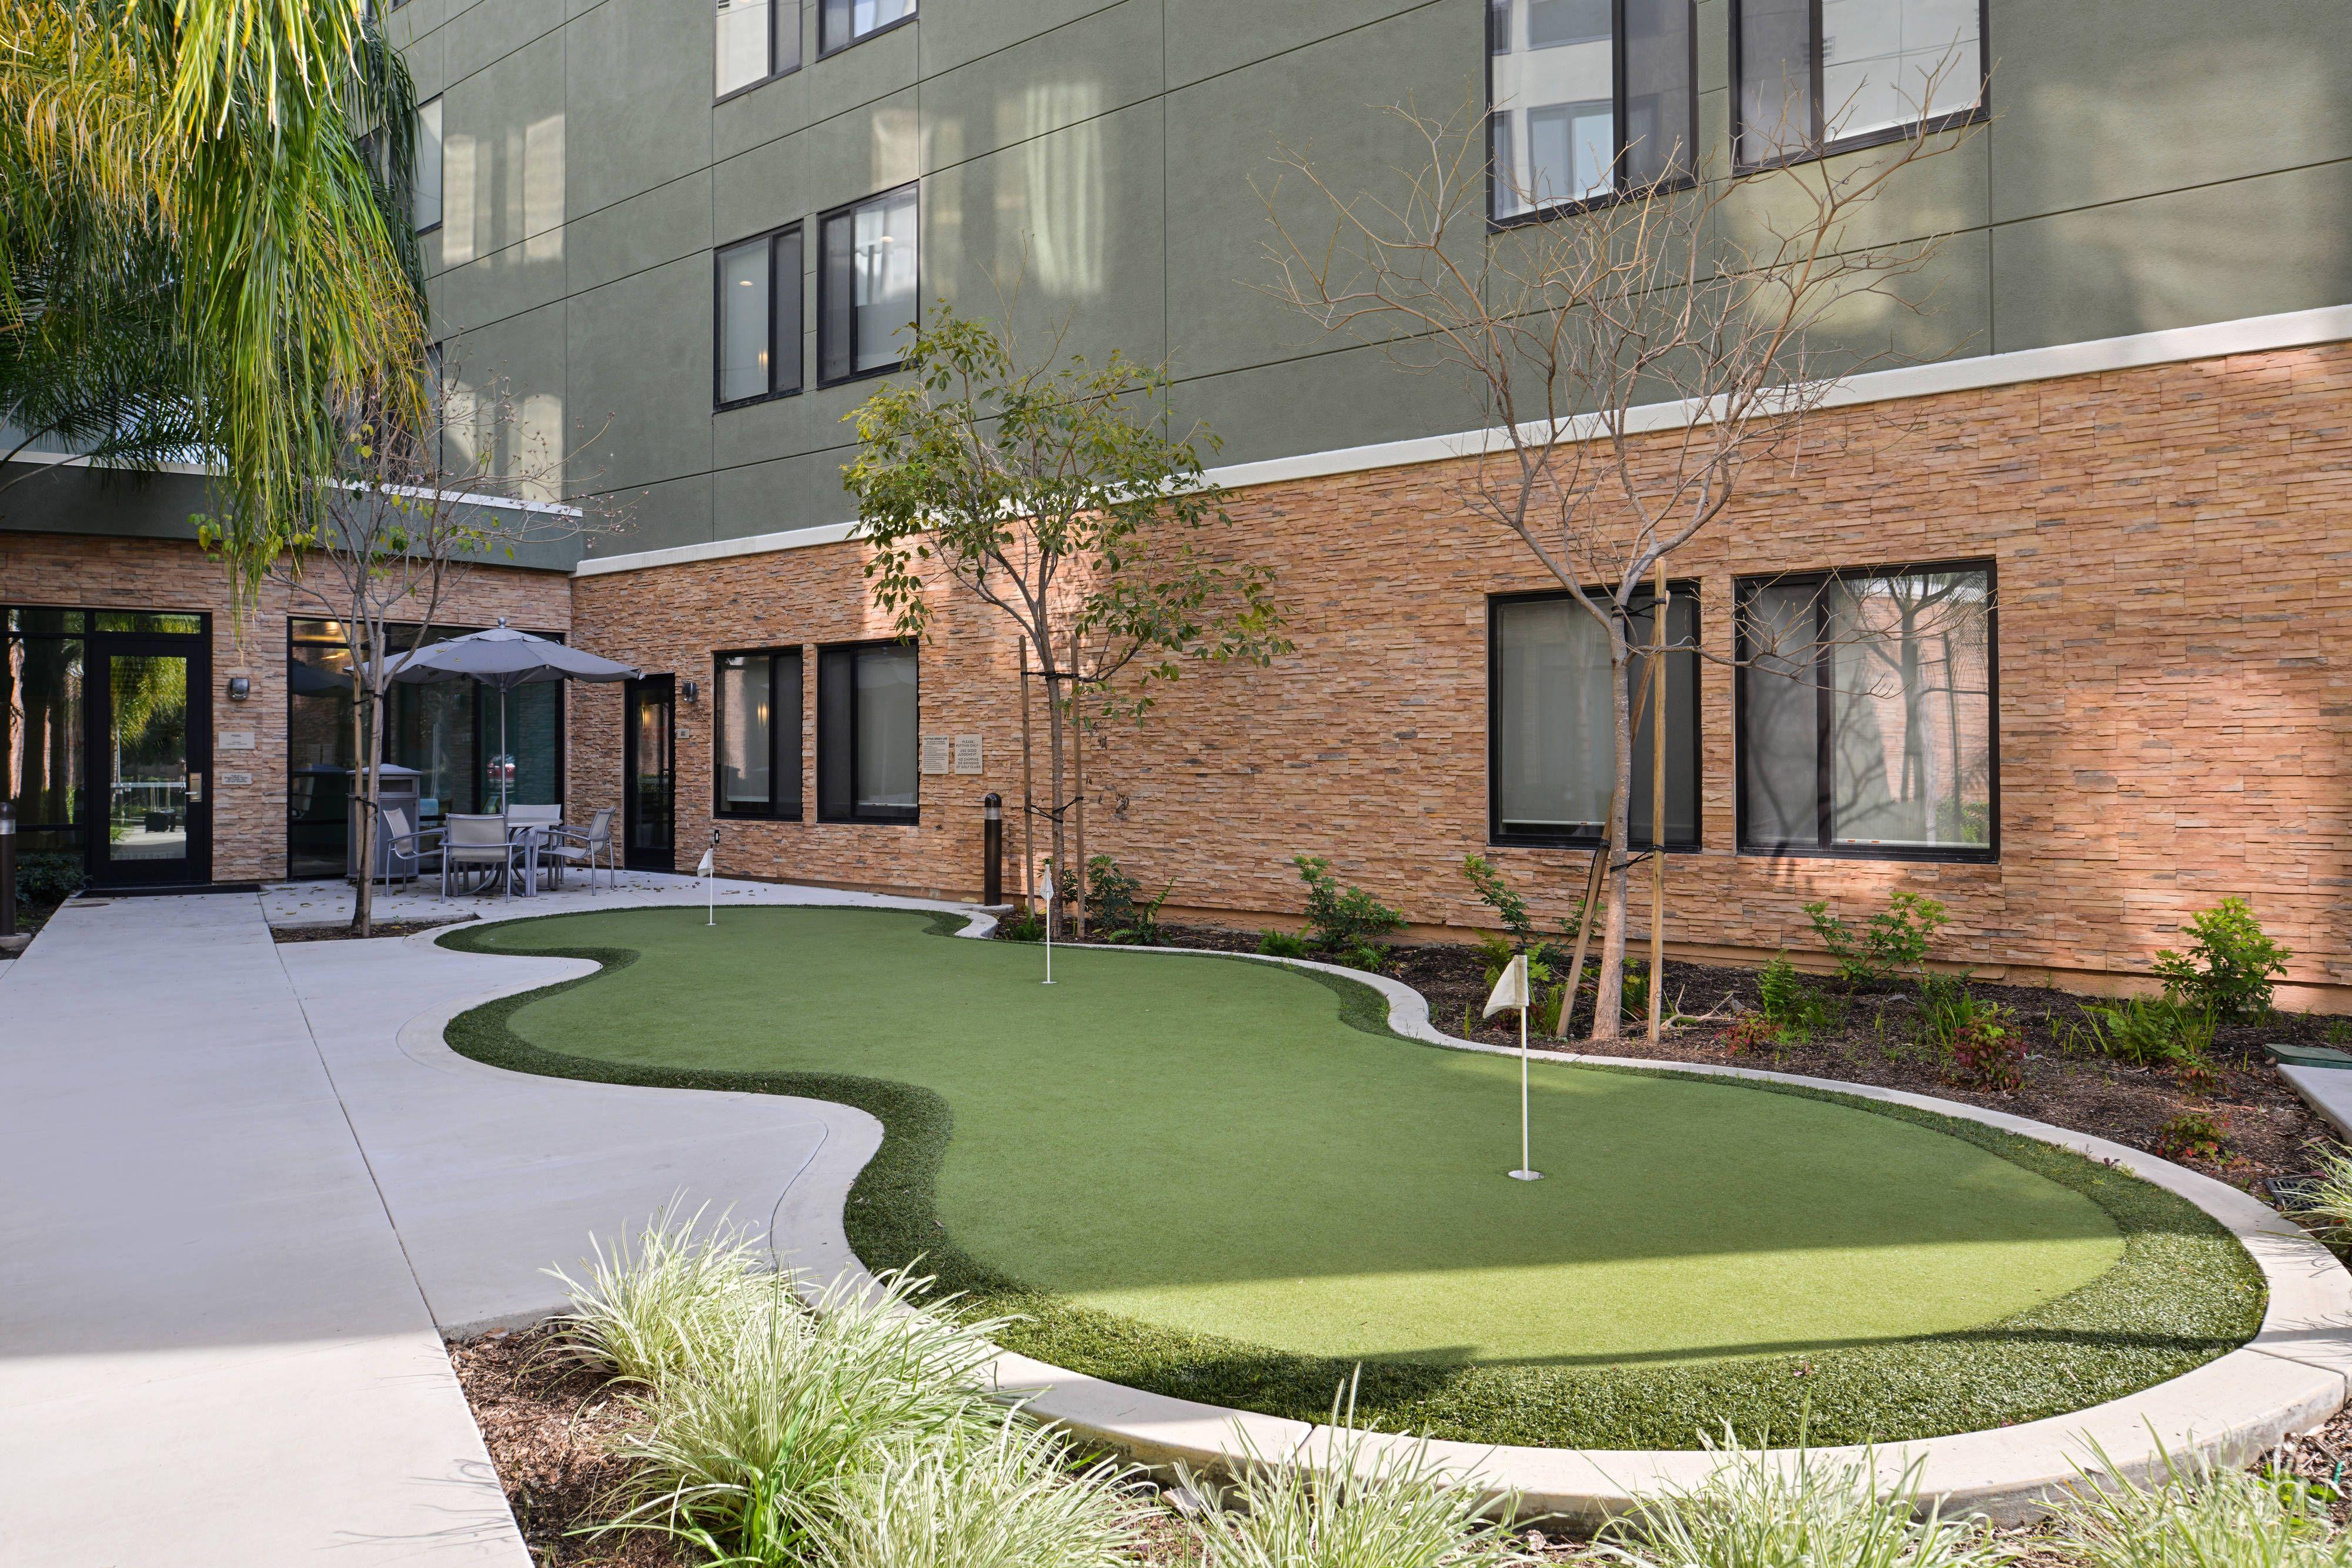 Springhill Suites Irvine John Wayne Airport Orange County Putting